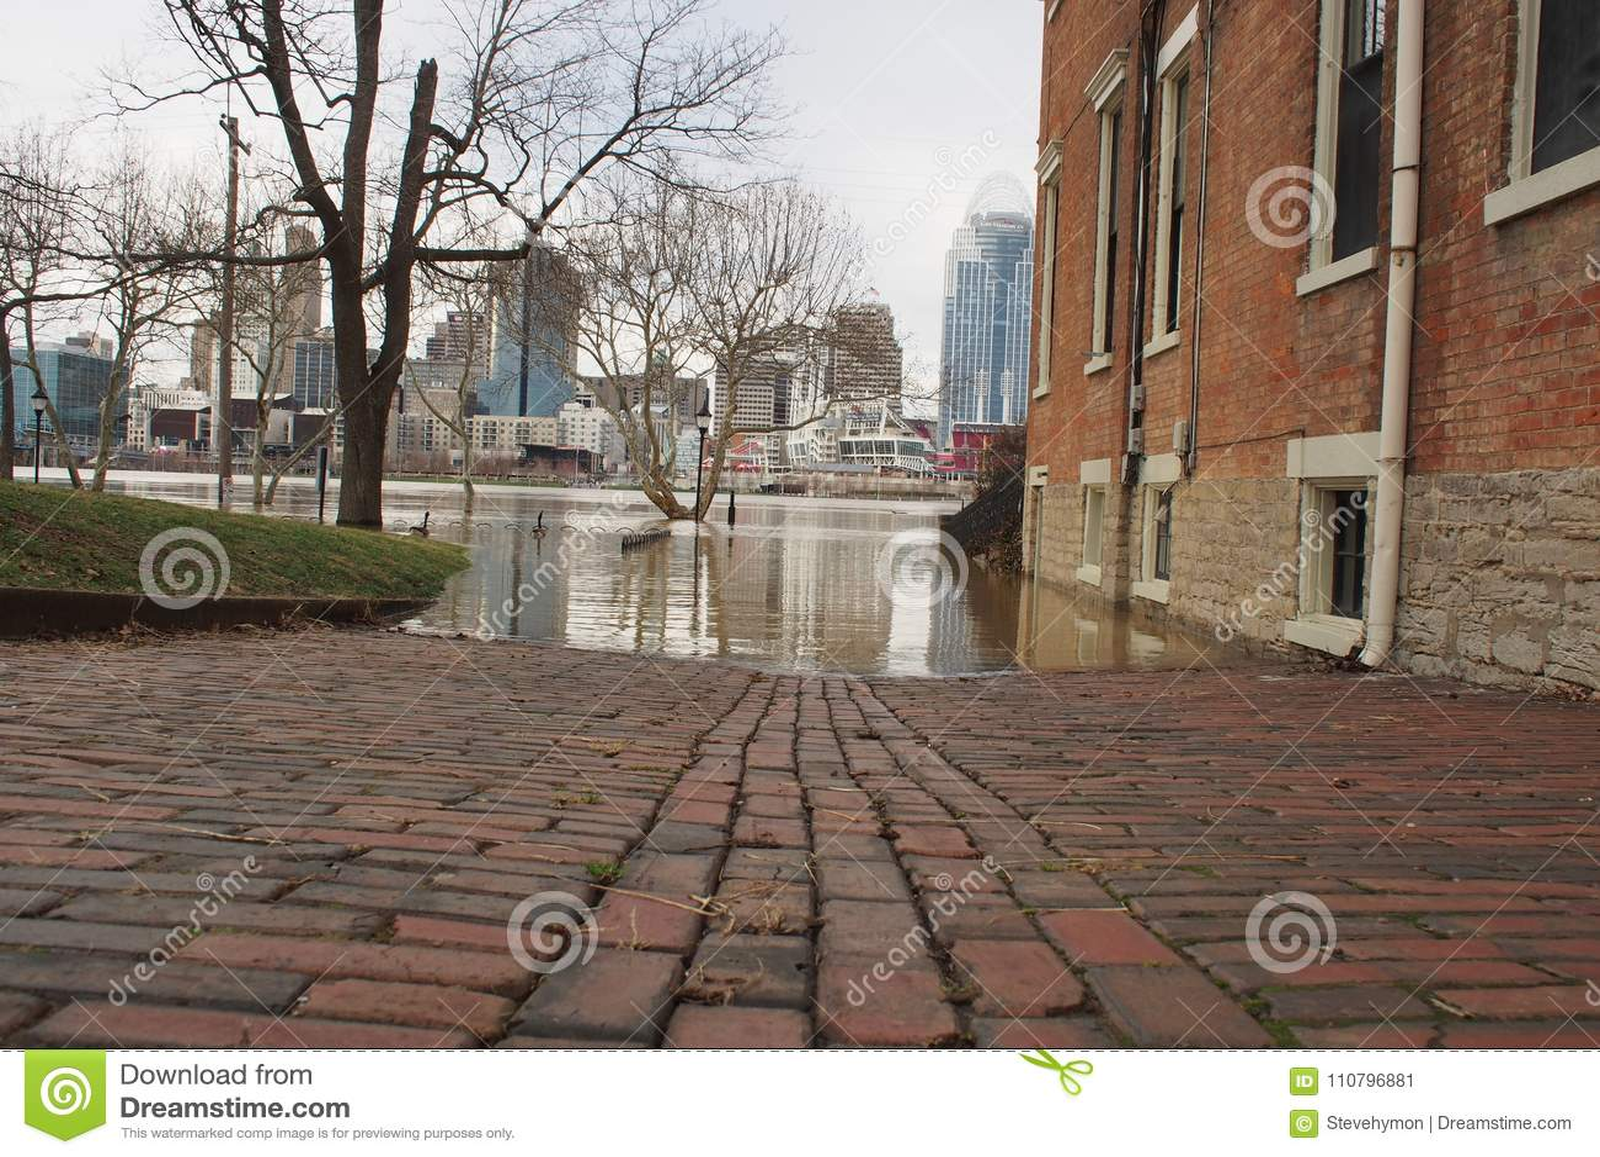 Ohio River flooding 2018 in Cincinnati